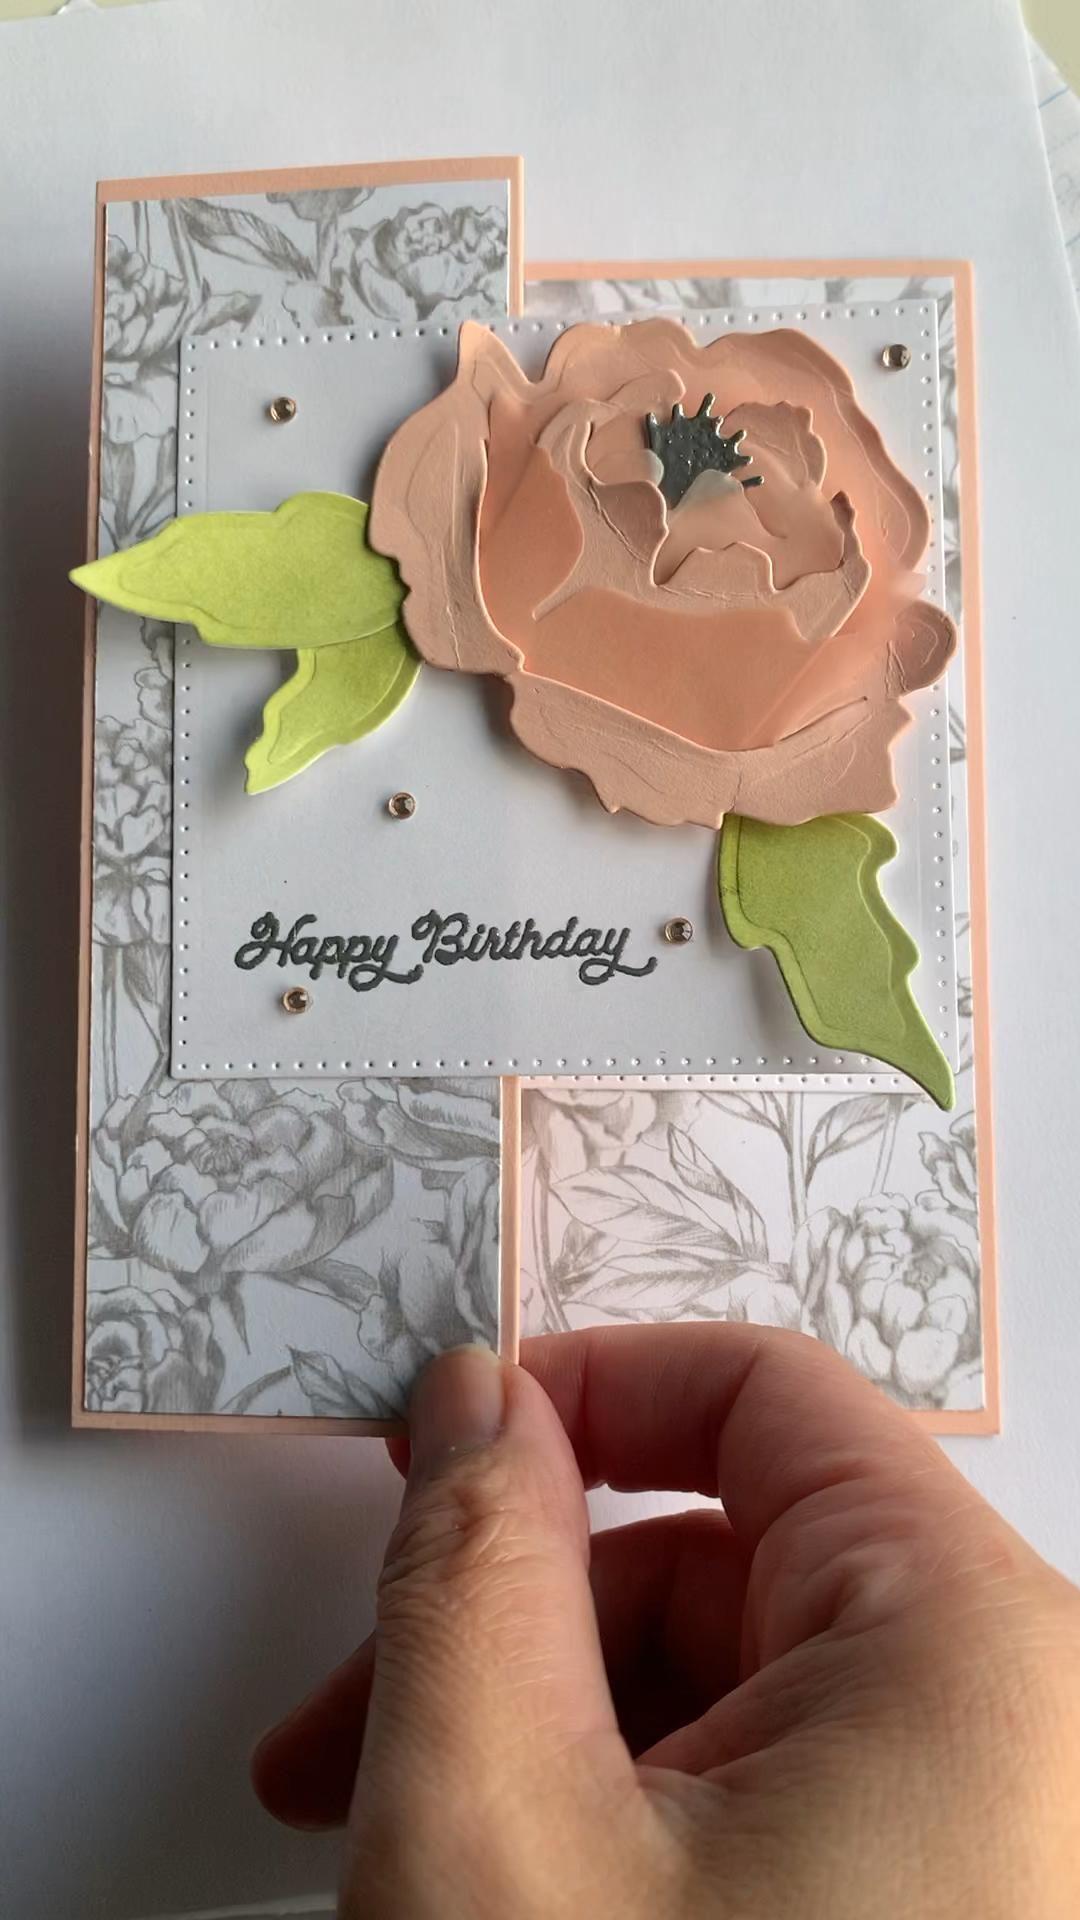 Stampin'Up Prized Peony fun fold card using Peony garden DSP DIY